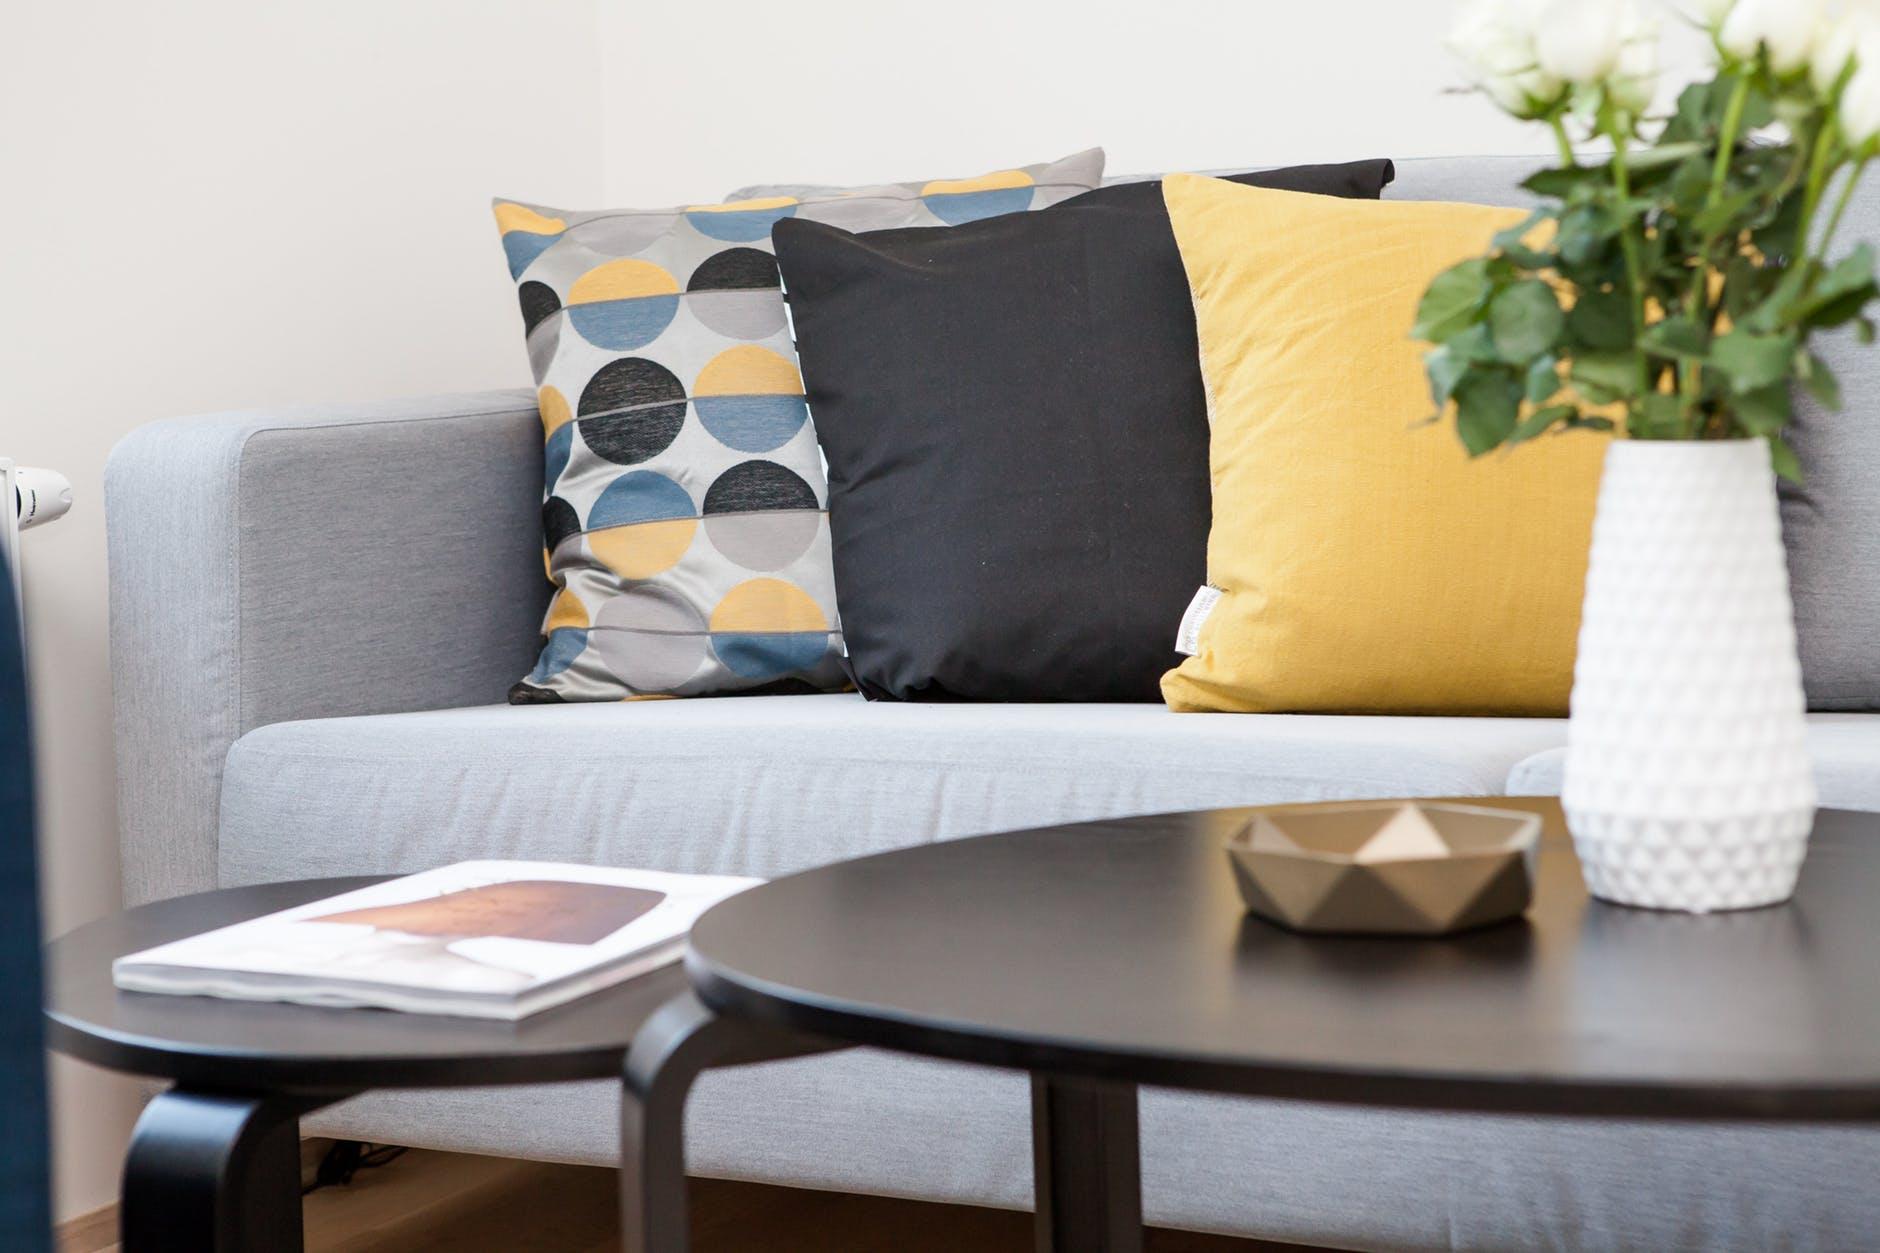 Interior Design Ideas for Small Homes